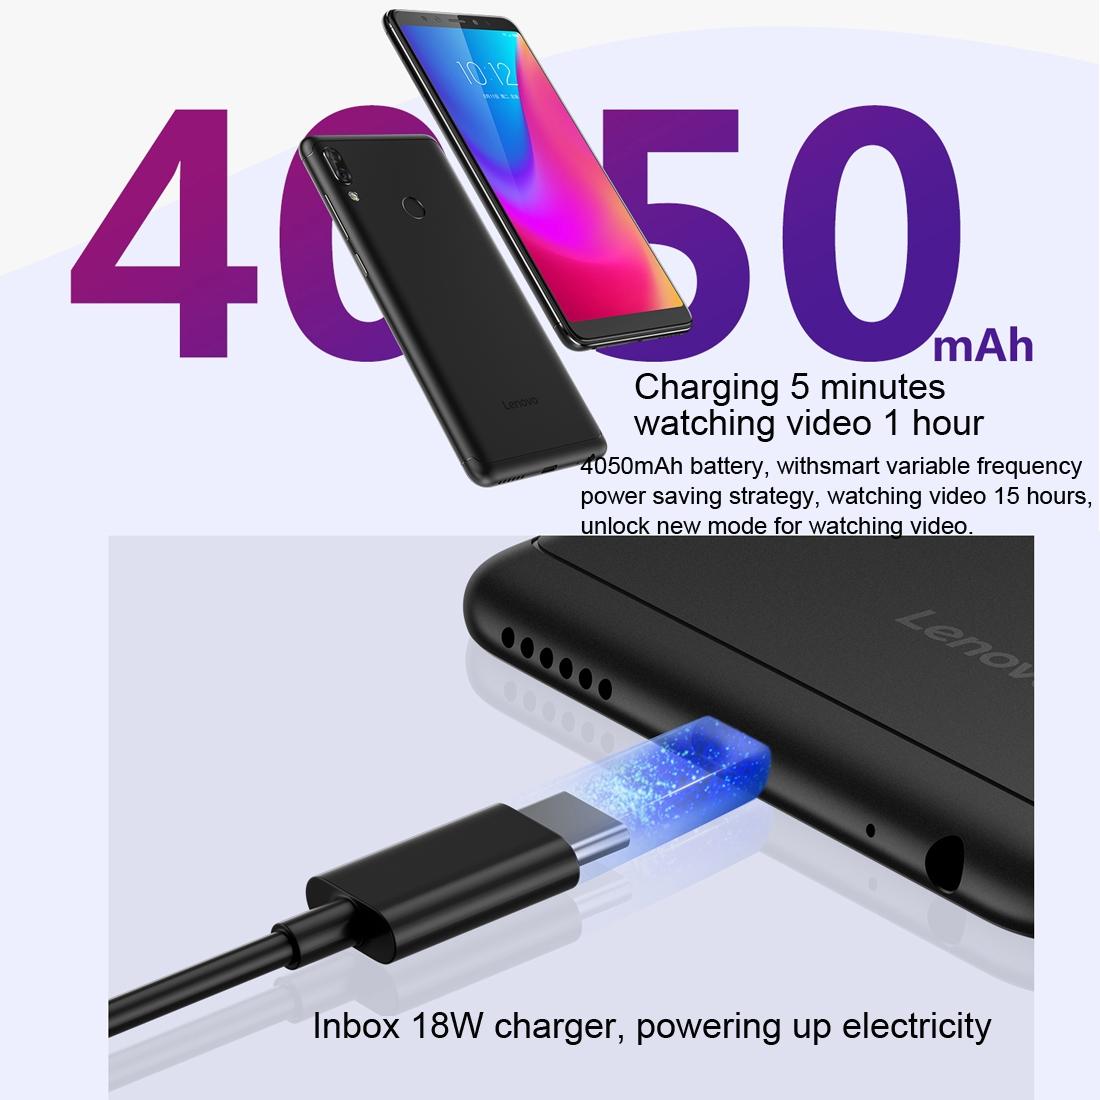 i.ibb.co/g308R4y/Smartphone-6-GB-64-GB-Lenovo-K5-Pro-Preto-13.jpg